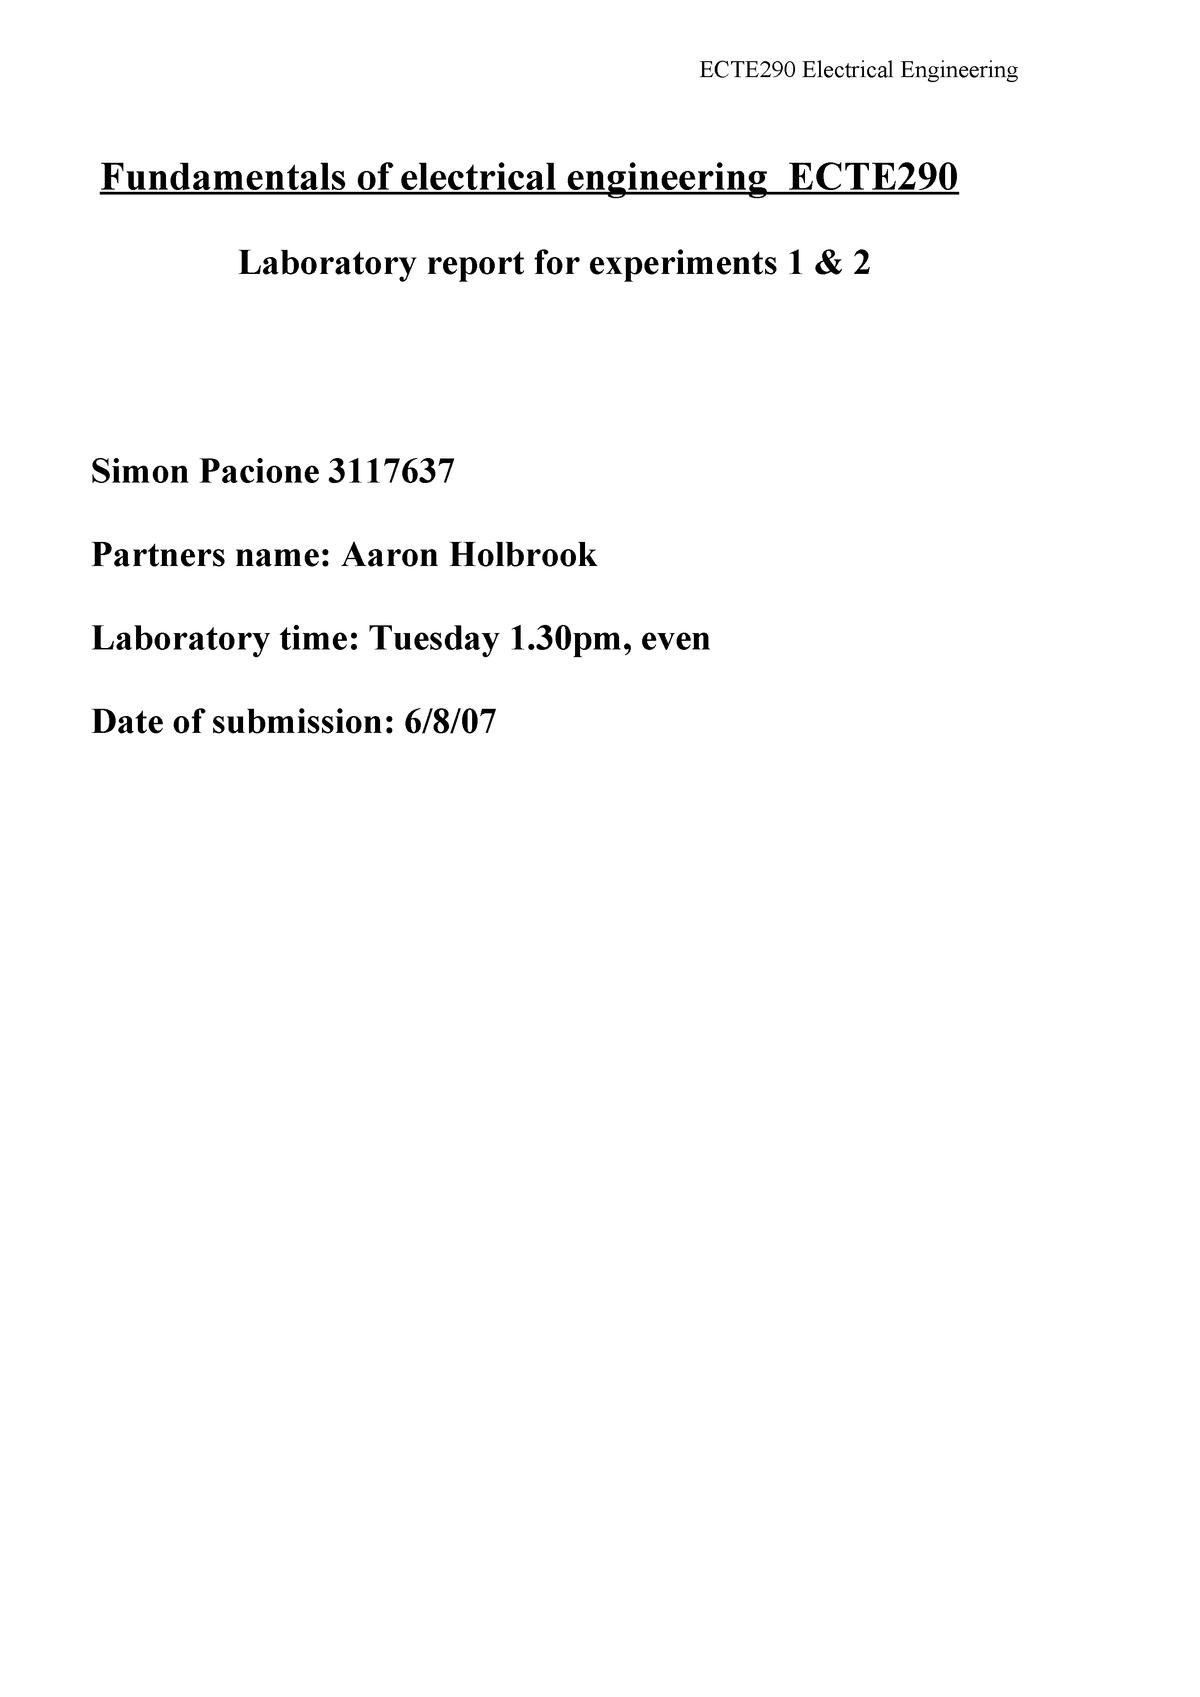 Practical - experiments 1-2 lab report - ECTE290 - UOW - StuDocu